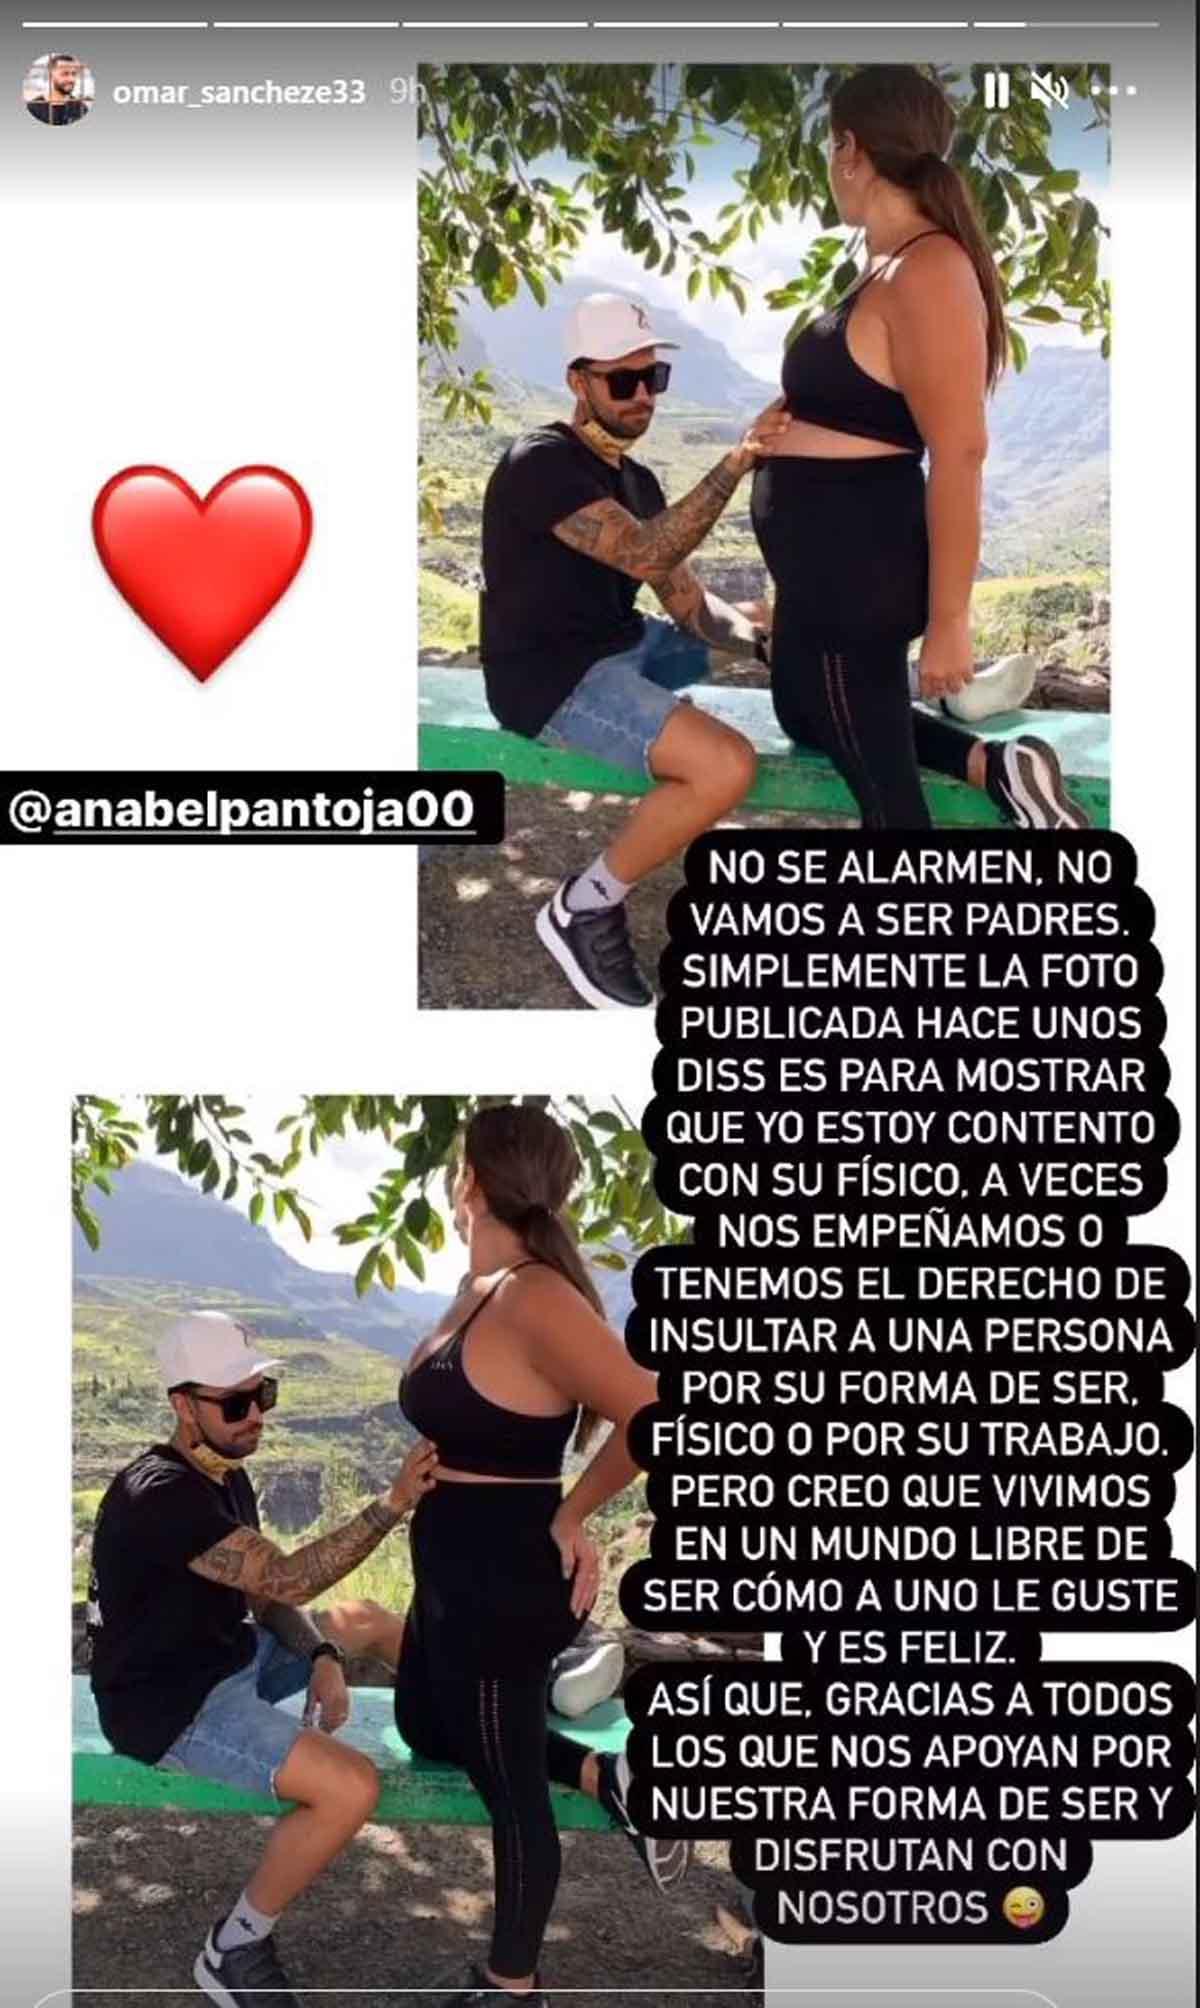 Omar Sánchez Anabel Pantoja